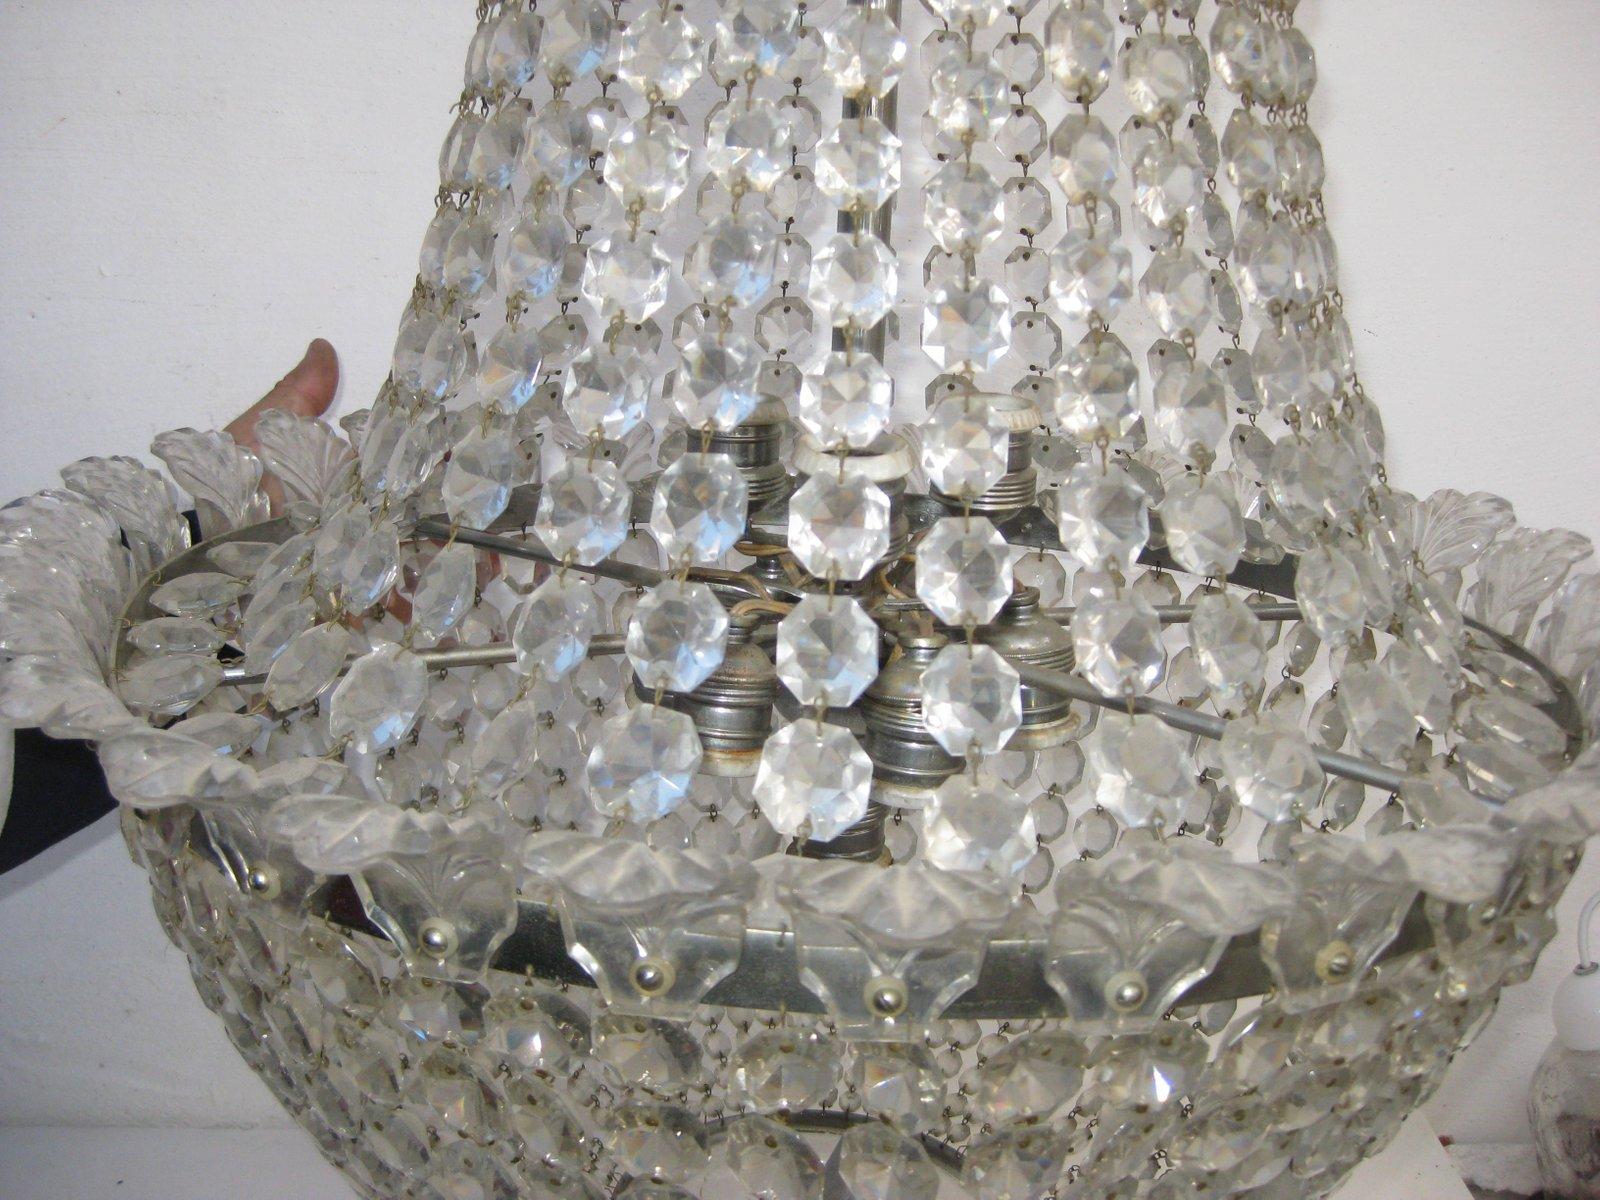 Lampe im Imperial-Stil von Baccarat, 1940er